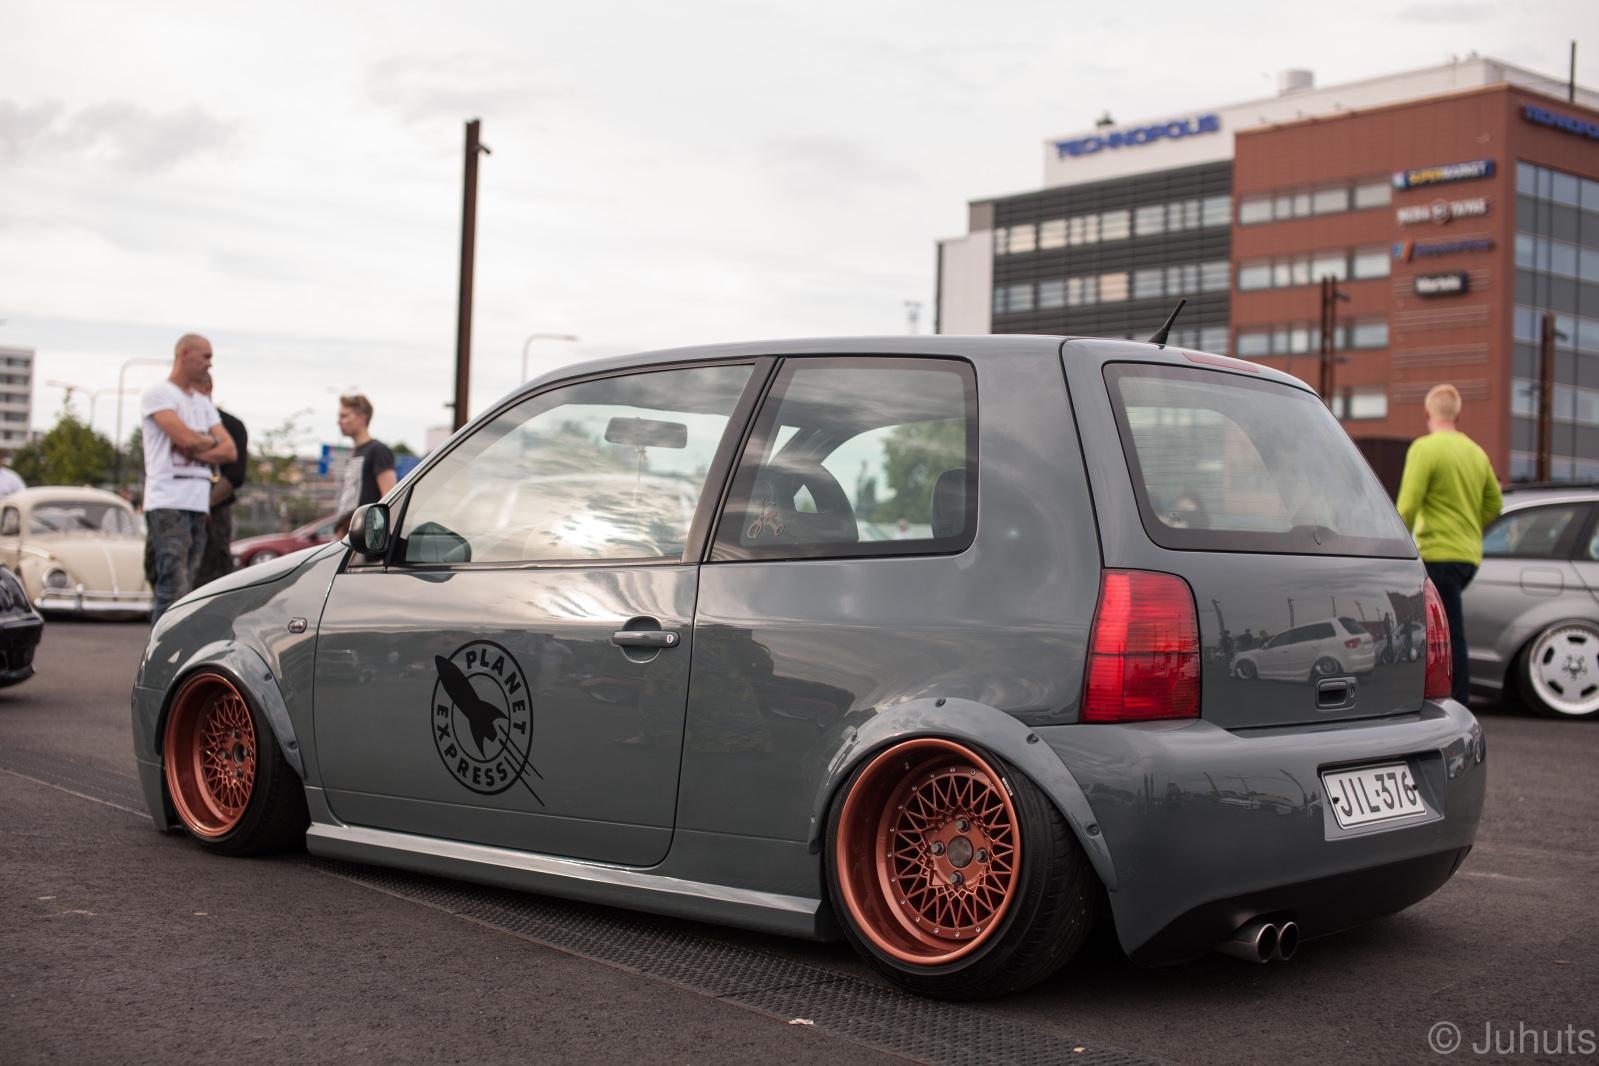 Wheelback: Baby Bender - Lupo - Sivu 7 2uqd79v